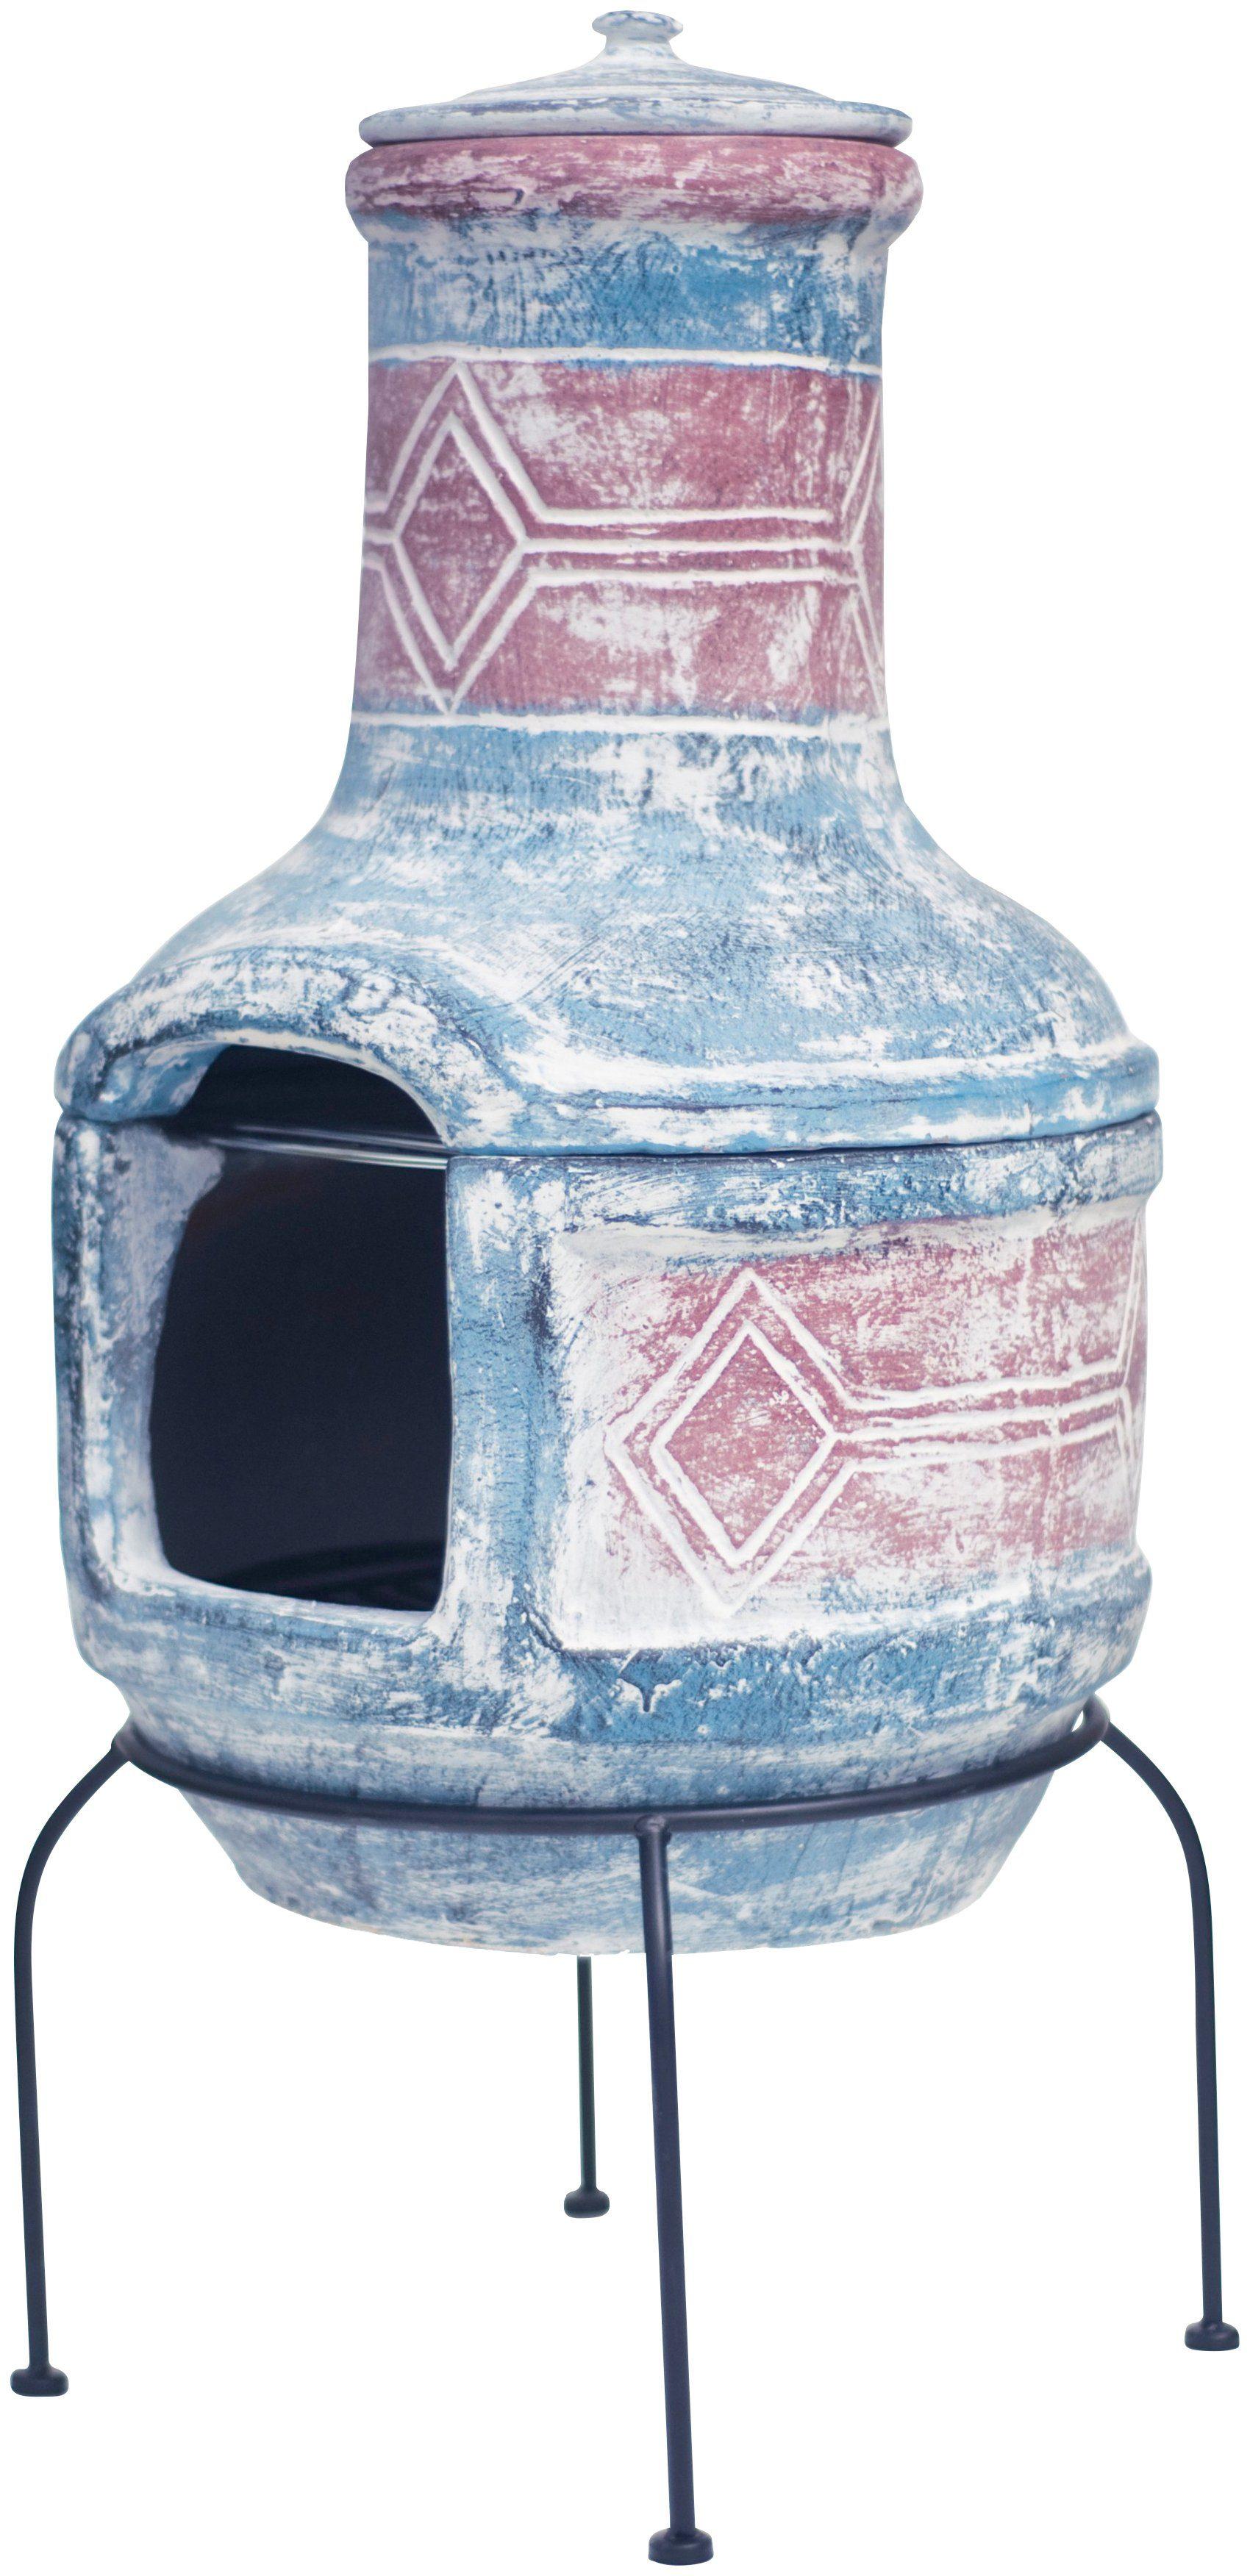 BUSCHBECK Gartenkamin »Mexiko-Grill-Kamin Geo design«, B/T/H: 40/40/56 cm